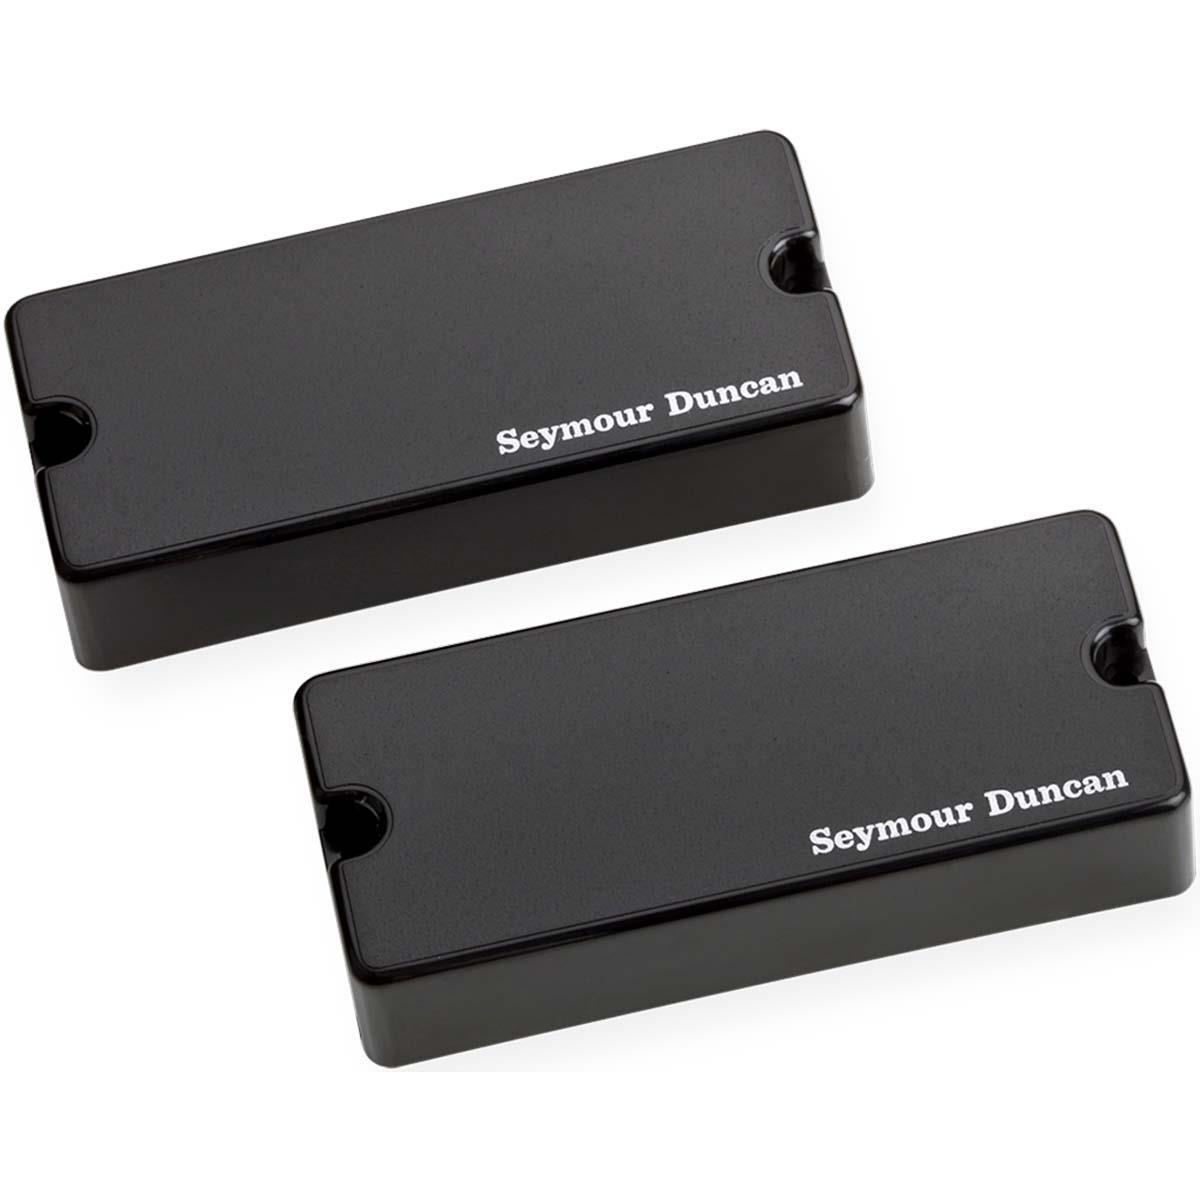 SEYMOUR-DUNCAN-SSB-4S-Phase-II-Passive-Set-SD1140542-11405-42-sku-4854